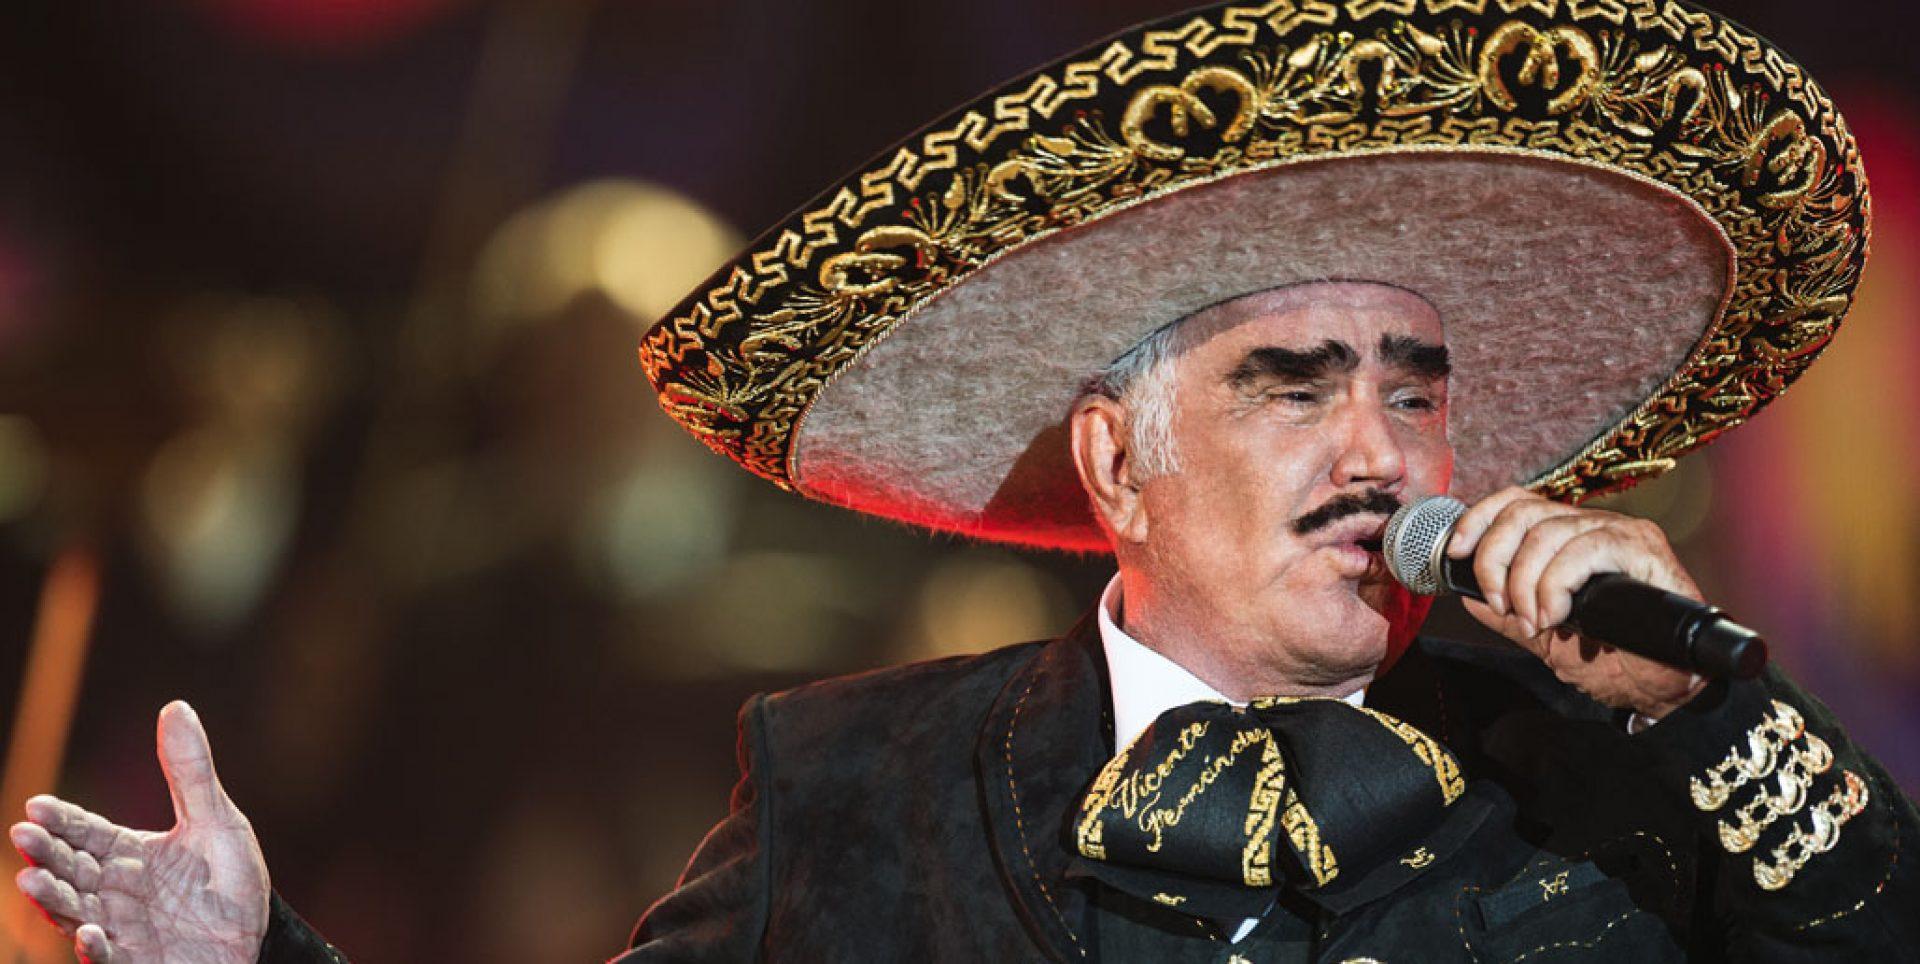 Vicente Fernández Sony Music Entertainment México